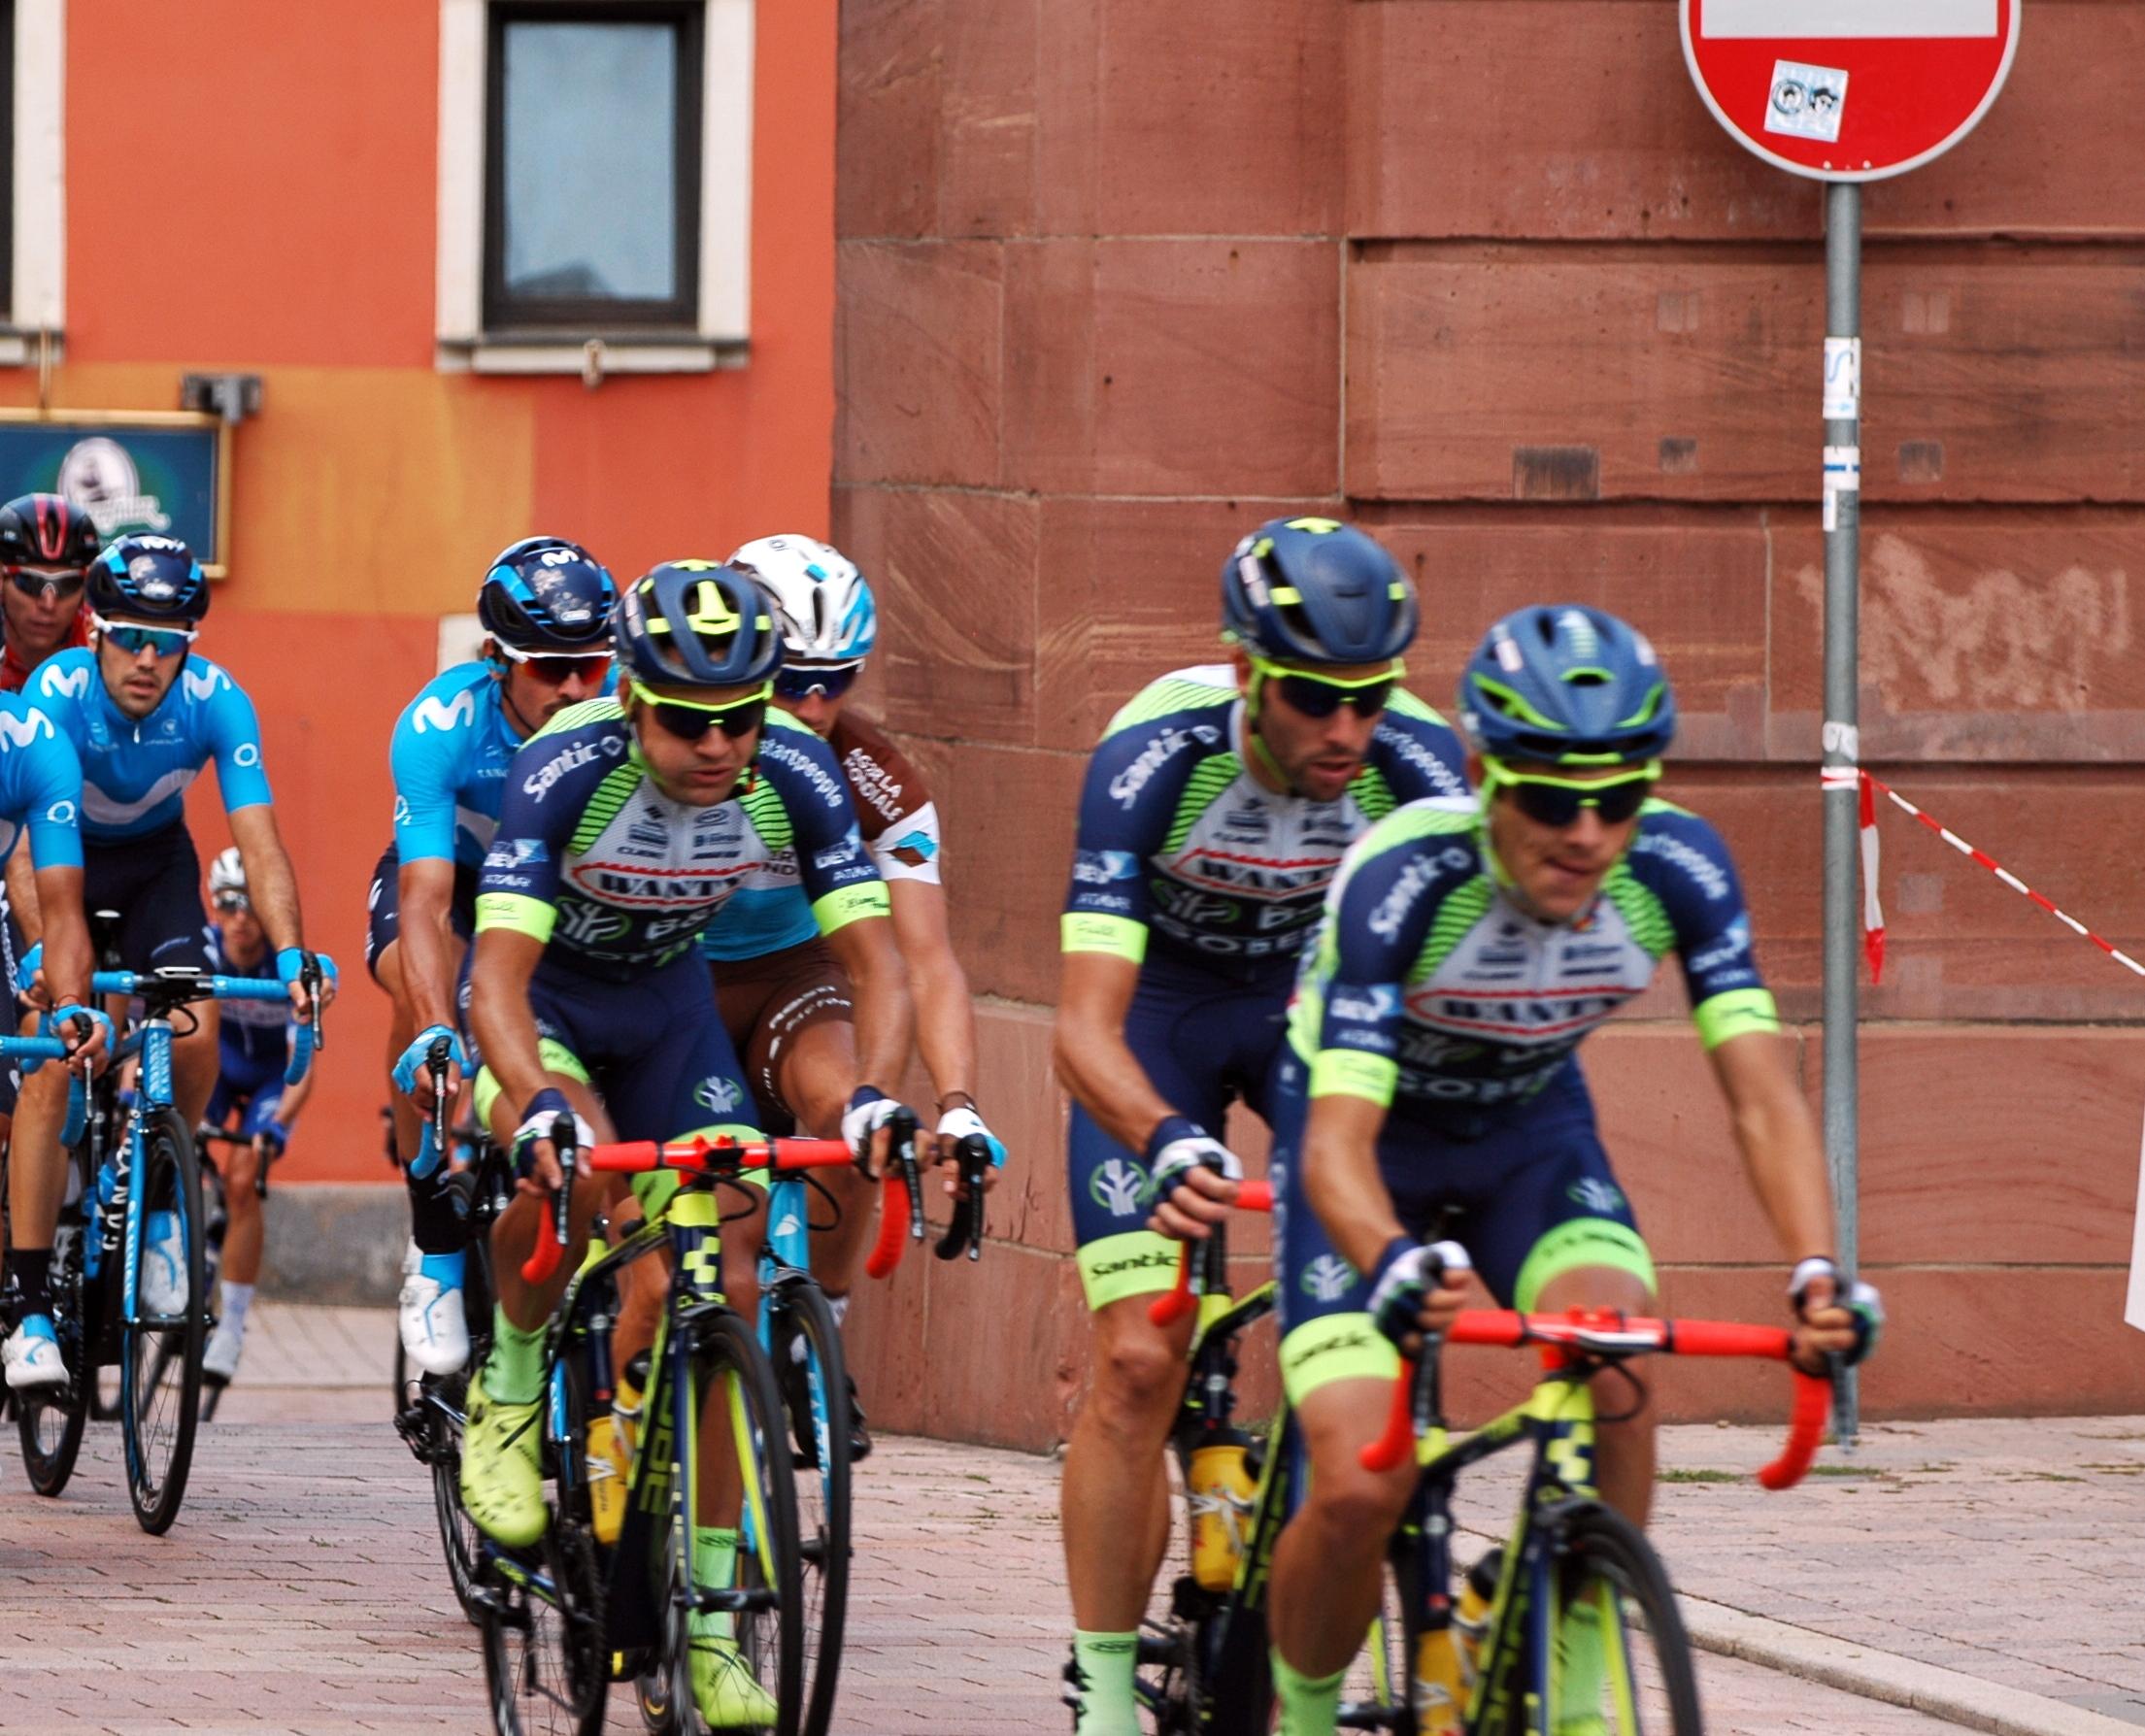 File Neckargemünd - Deutschland Tour - Wanty-Groupe Gobert - 2018-08-26  13-31-17.jpg ea4f9e4fd